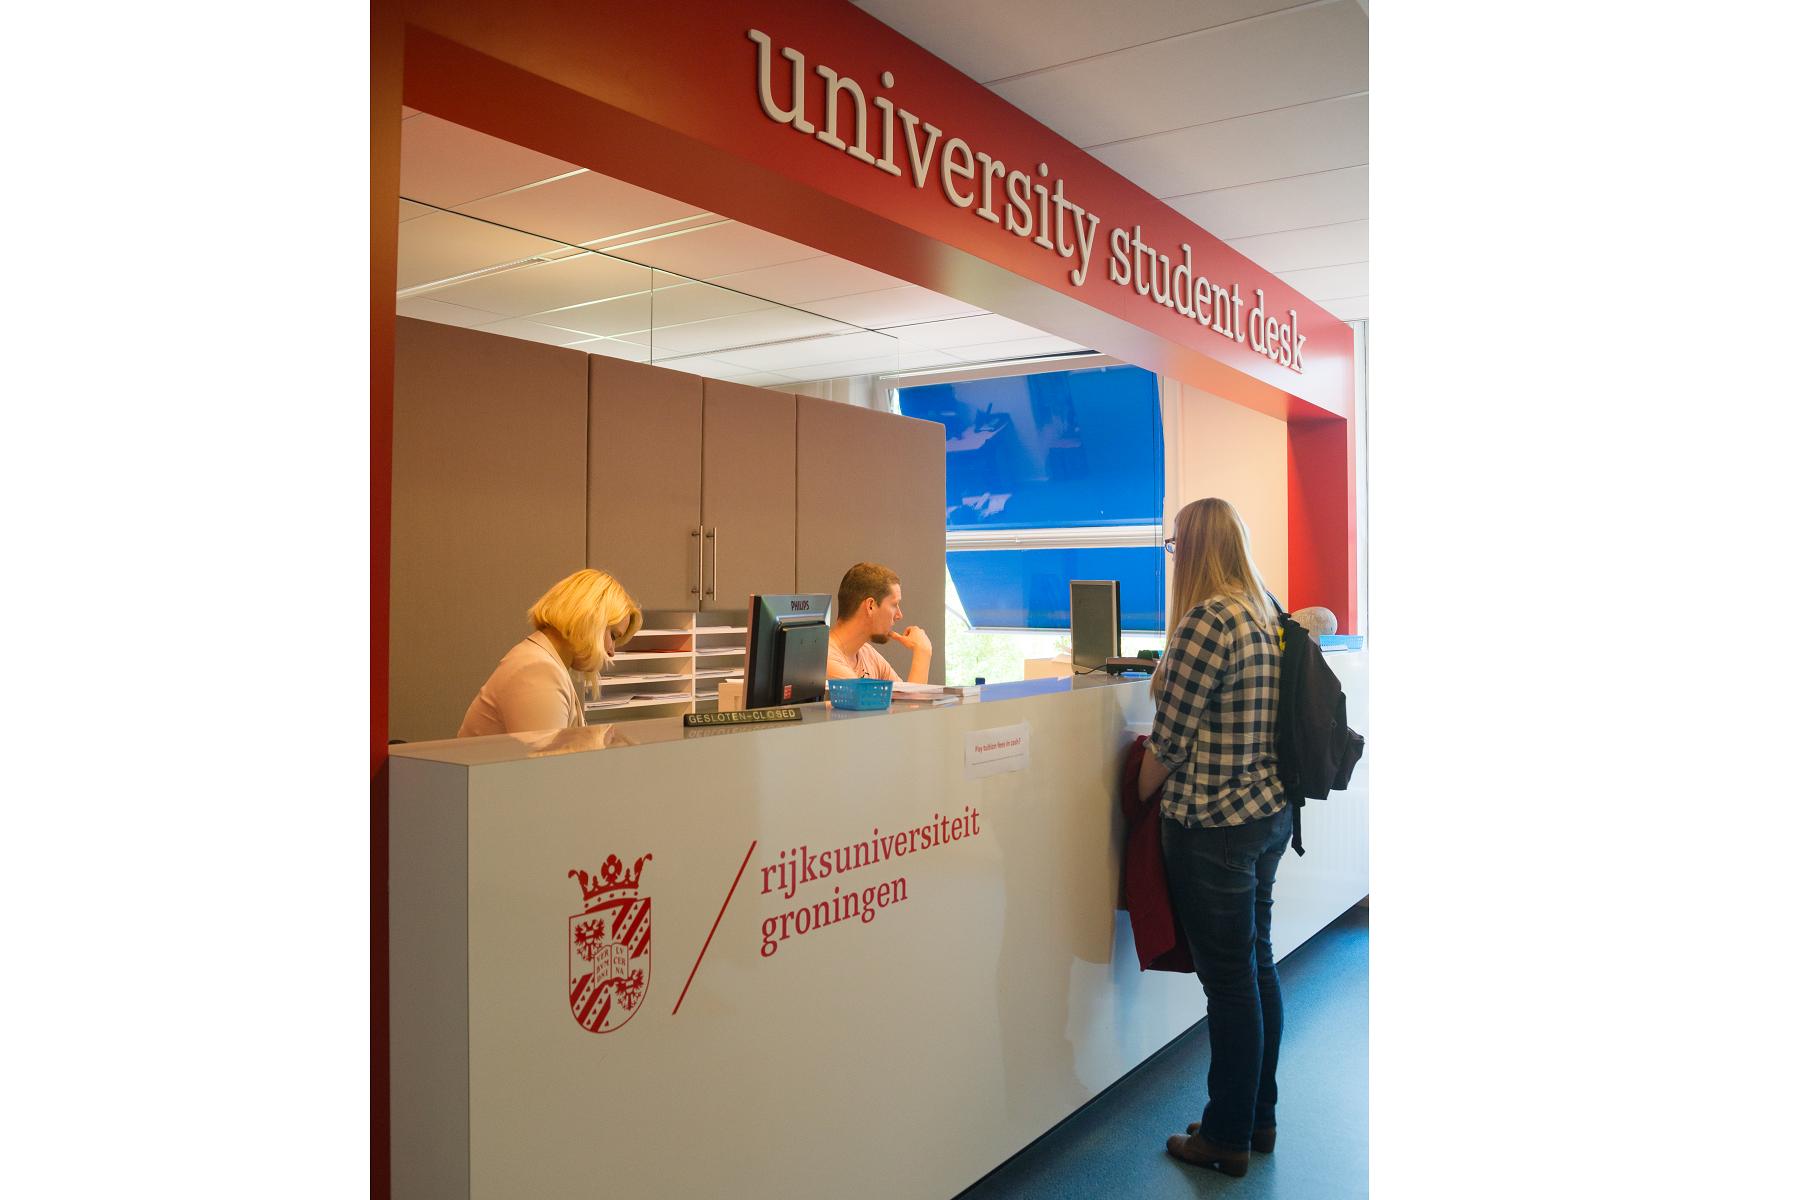 University student desk